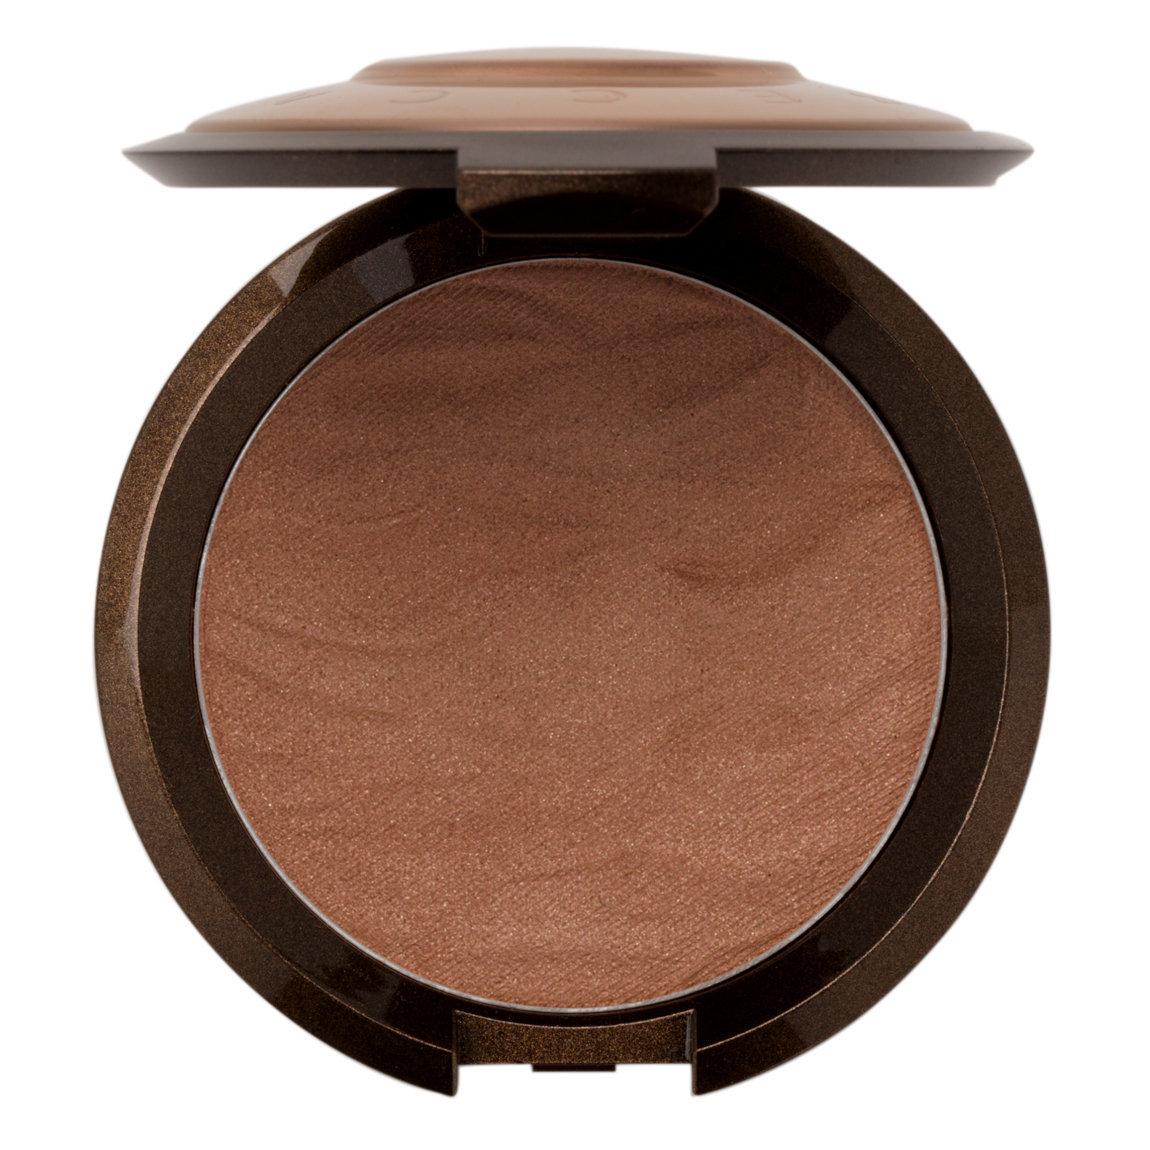 BECCA Cosmetics Sunlit Bronzer Bronzed Bondi alternative view 1 - product swatch.